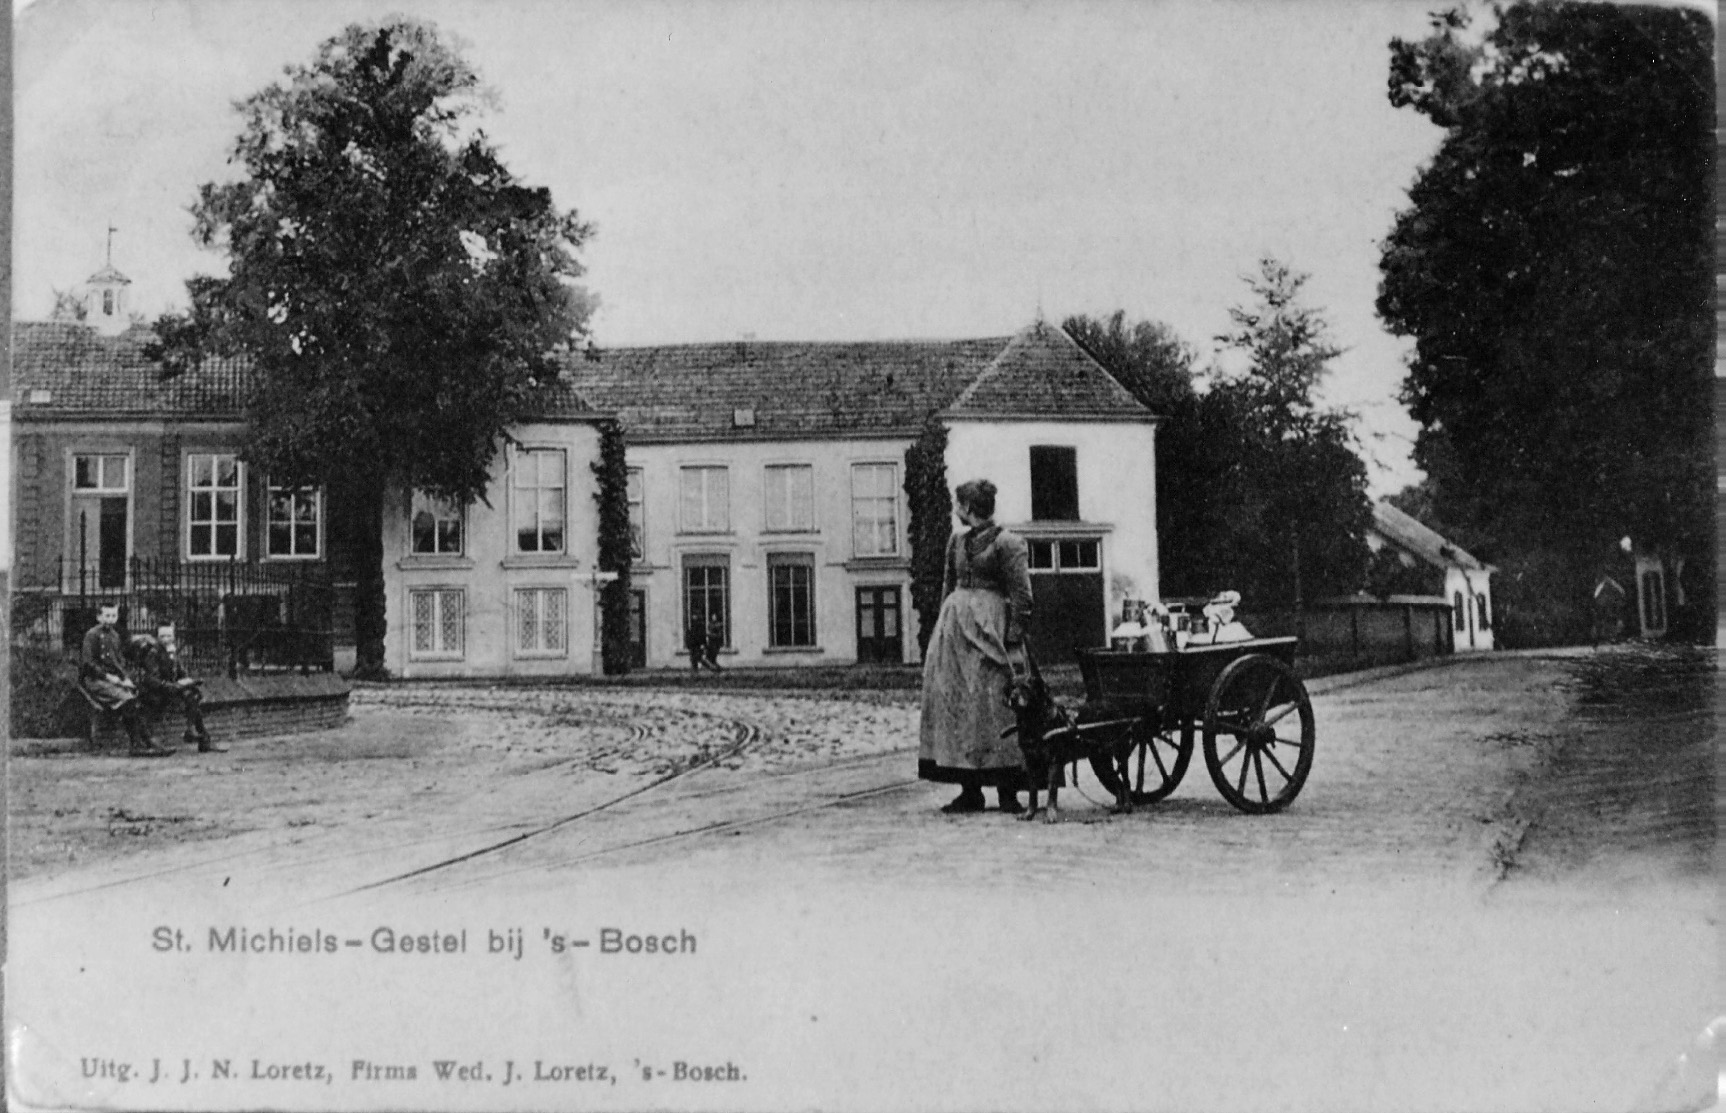 ca1910 Sint Michielsgestel bij 's Bosch, ut turp